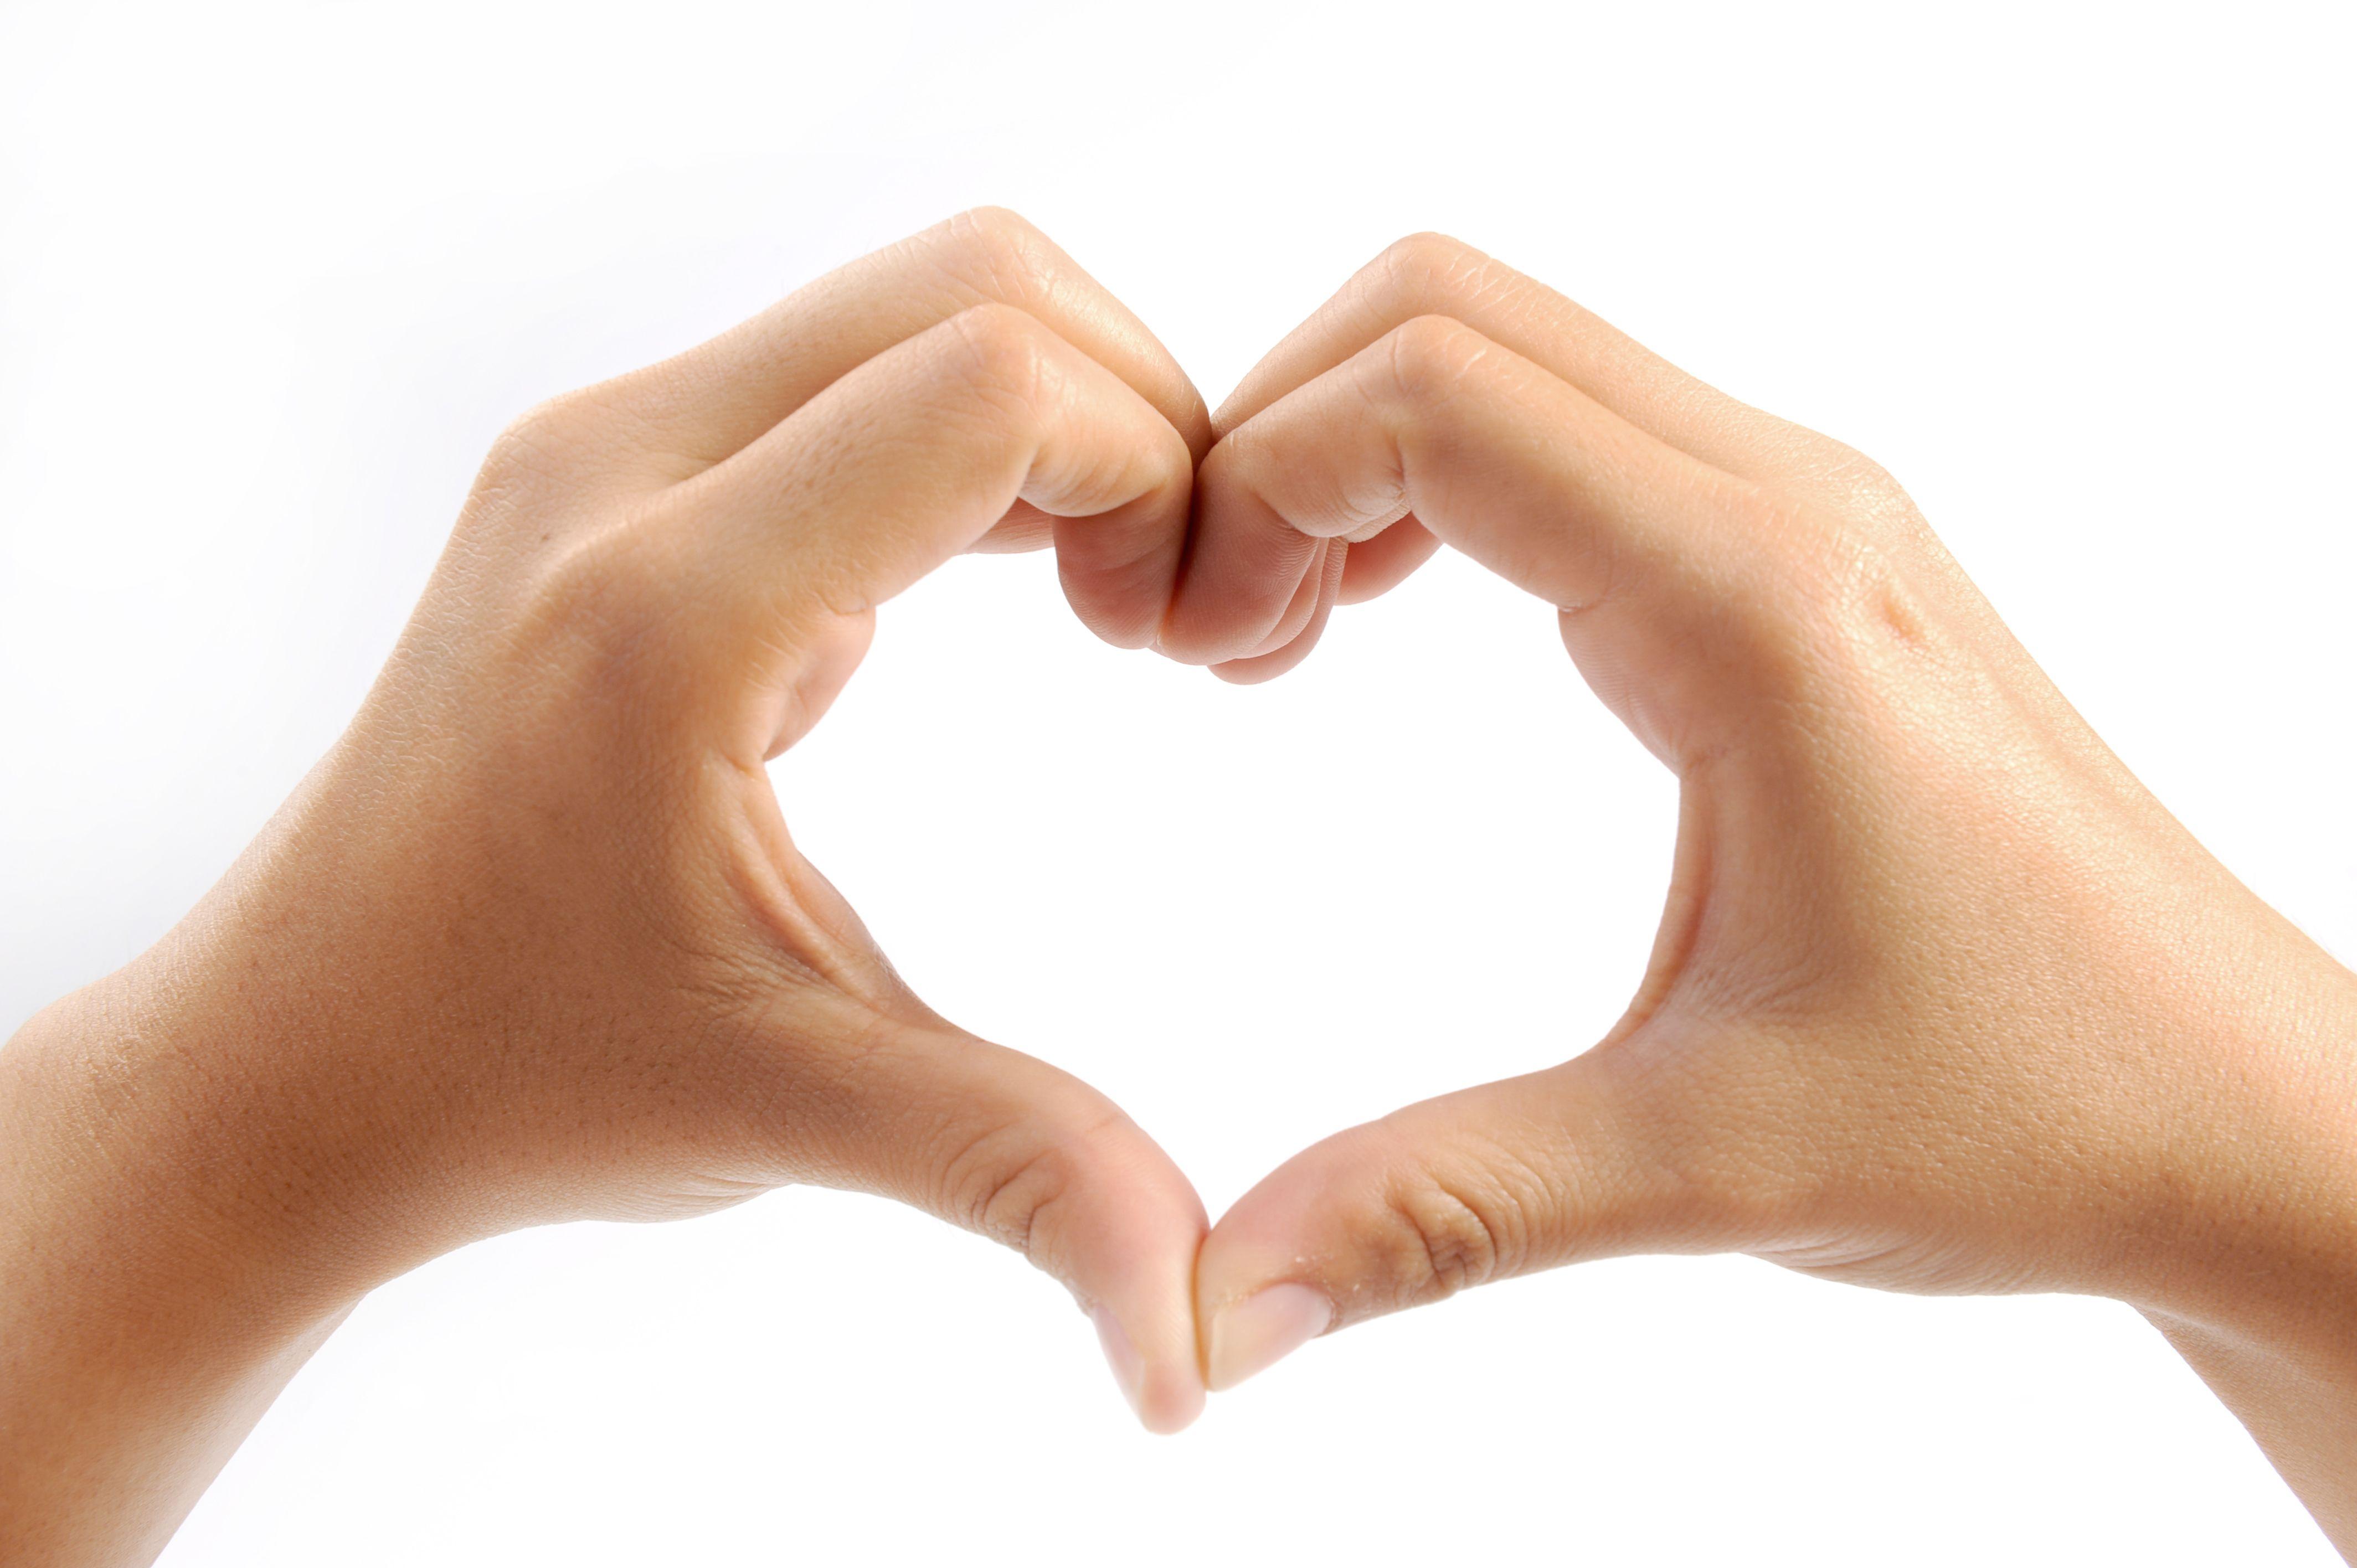 human hand heart | The Main Thing | Pinterest | Hand heart, Speakers ...